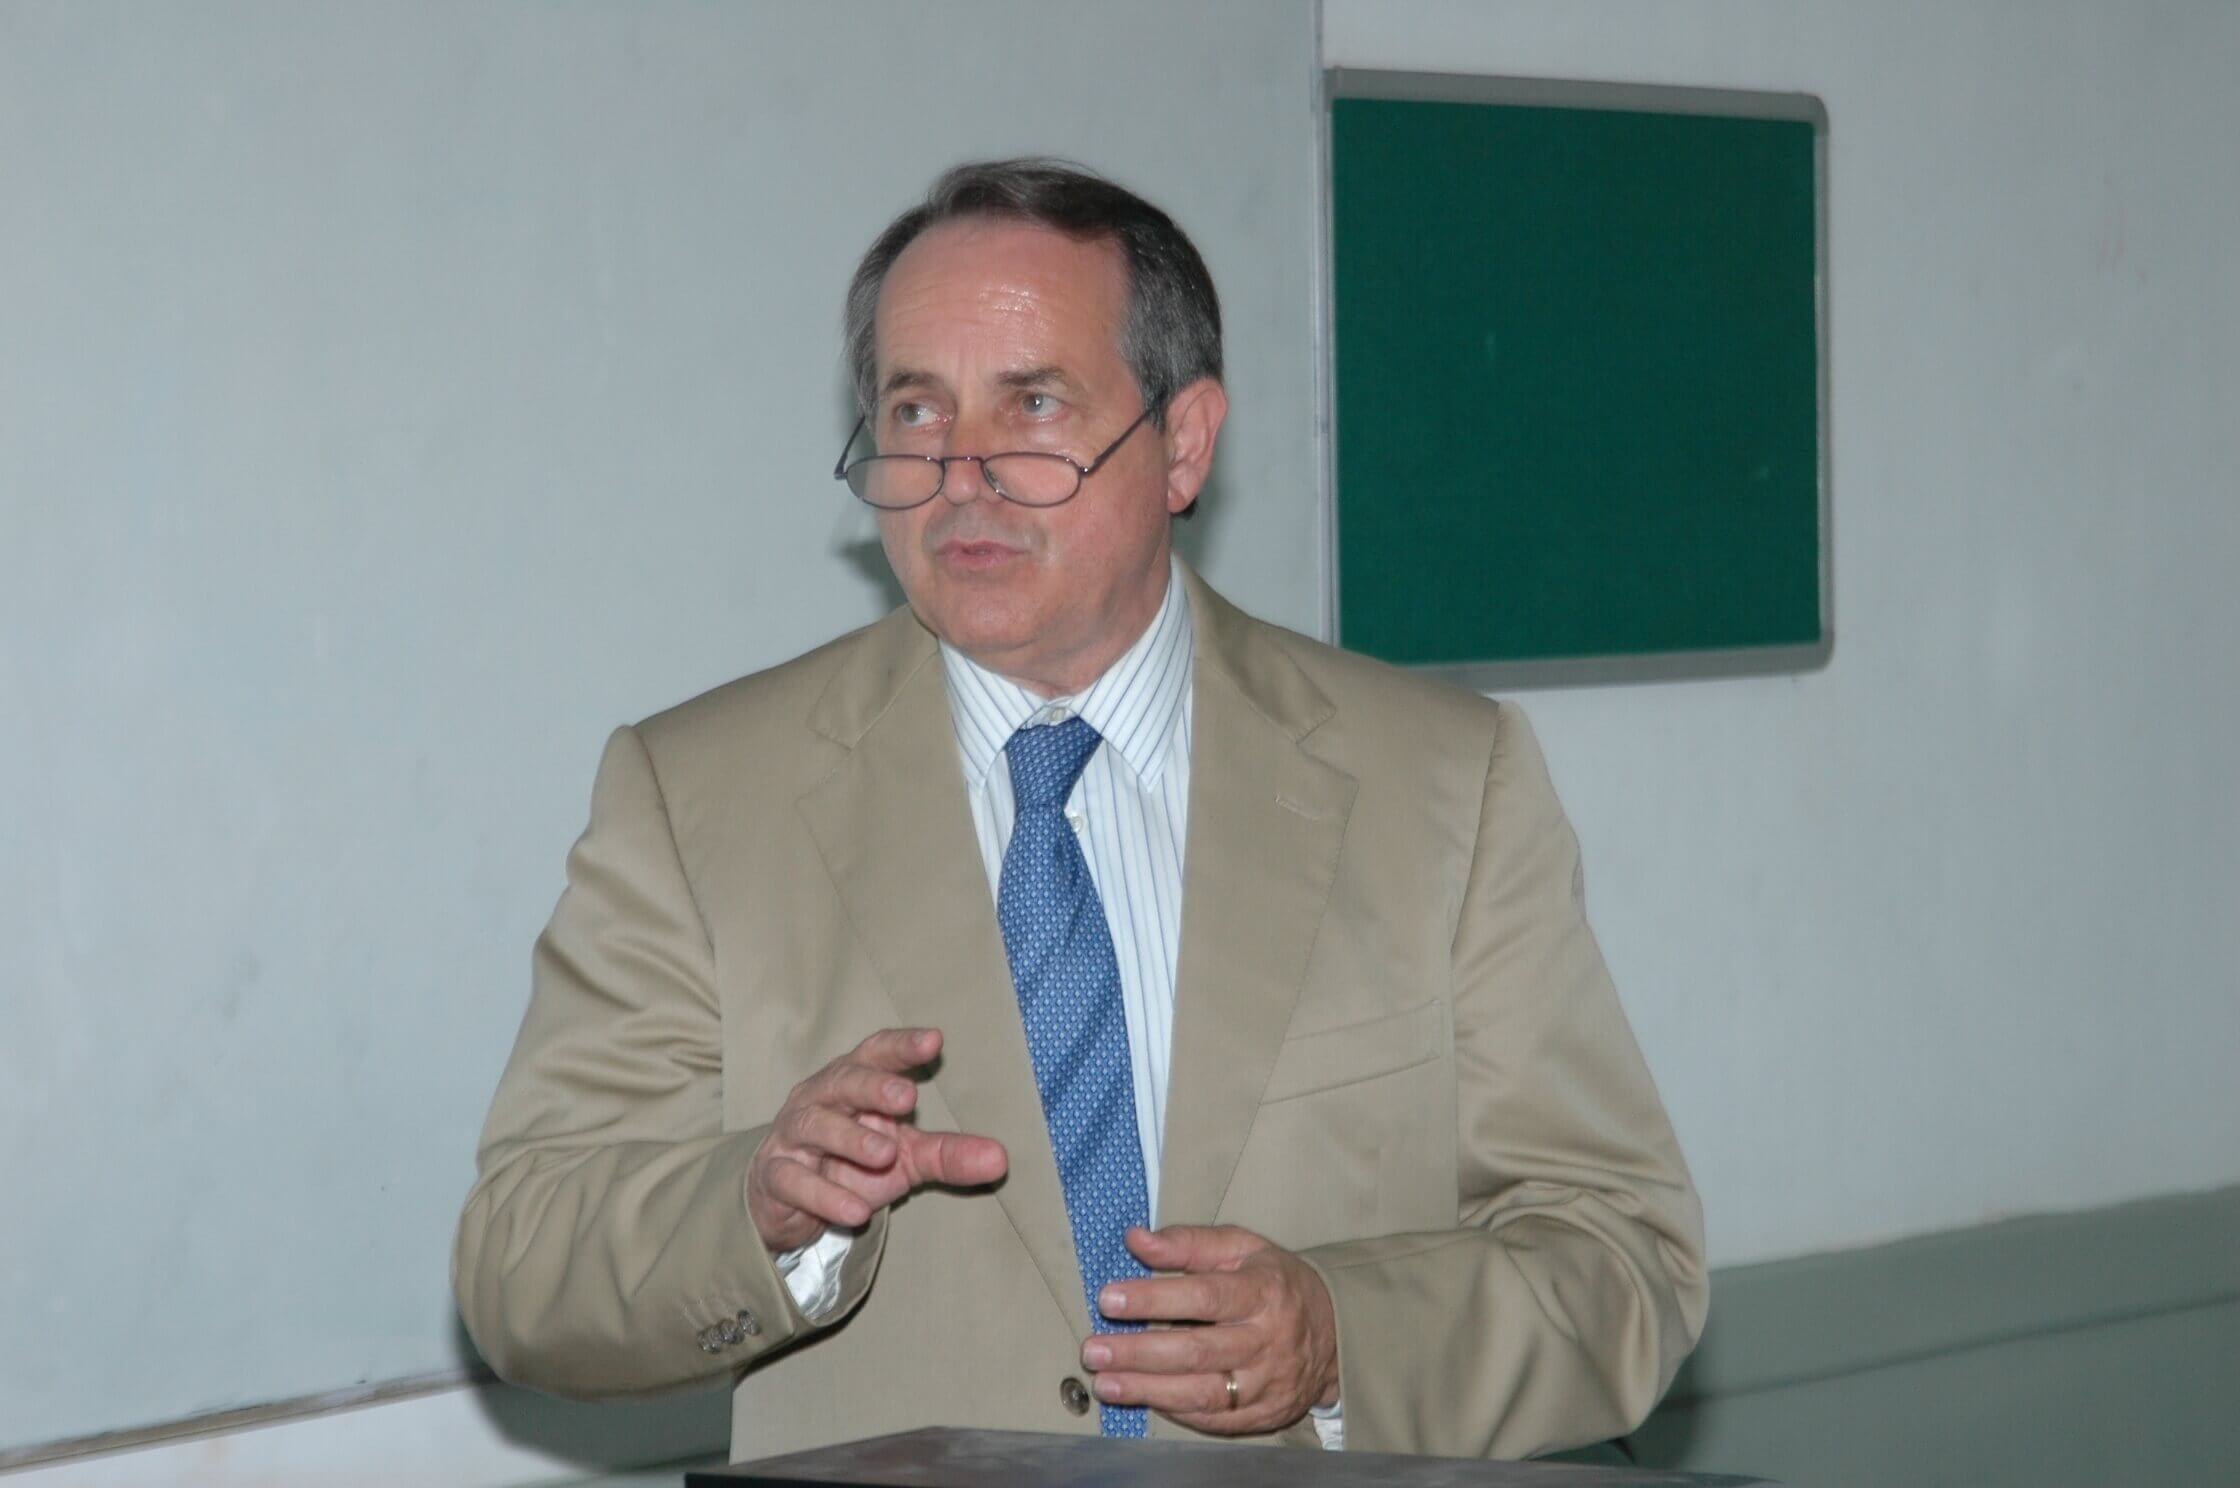 Prof Toribioon